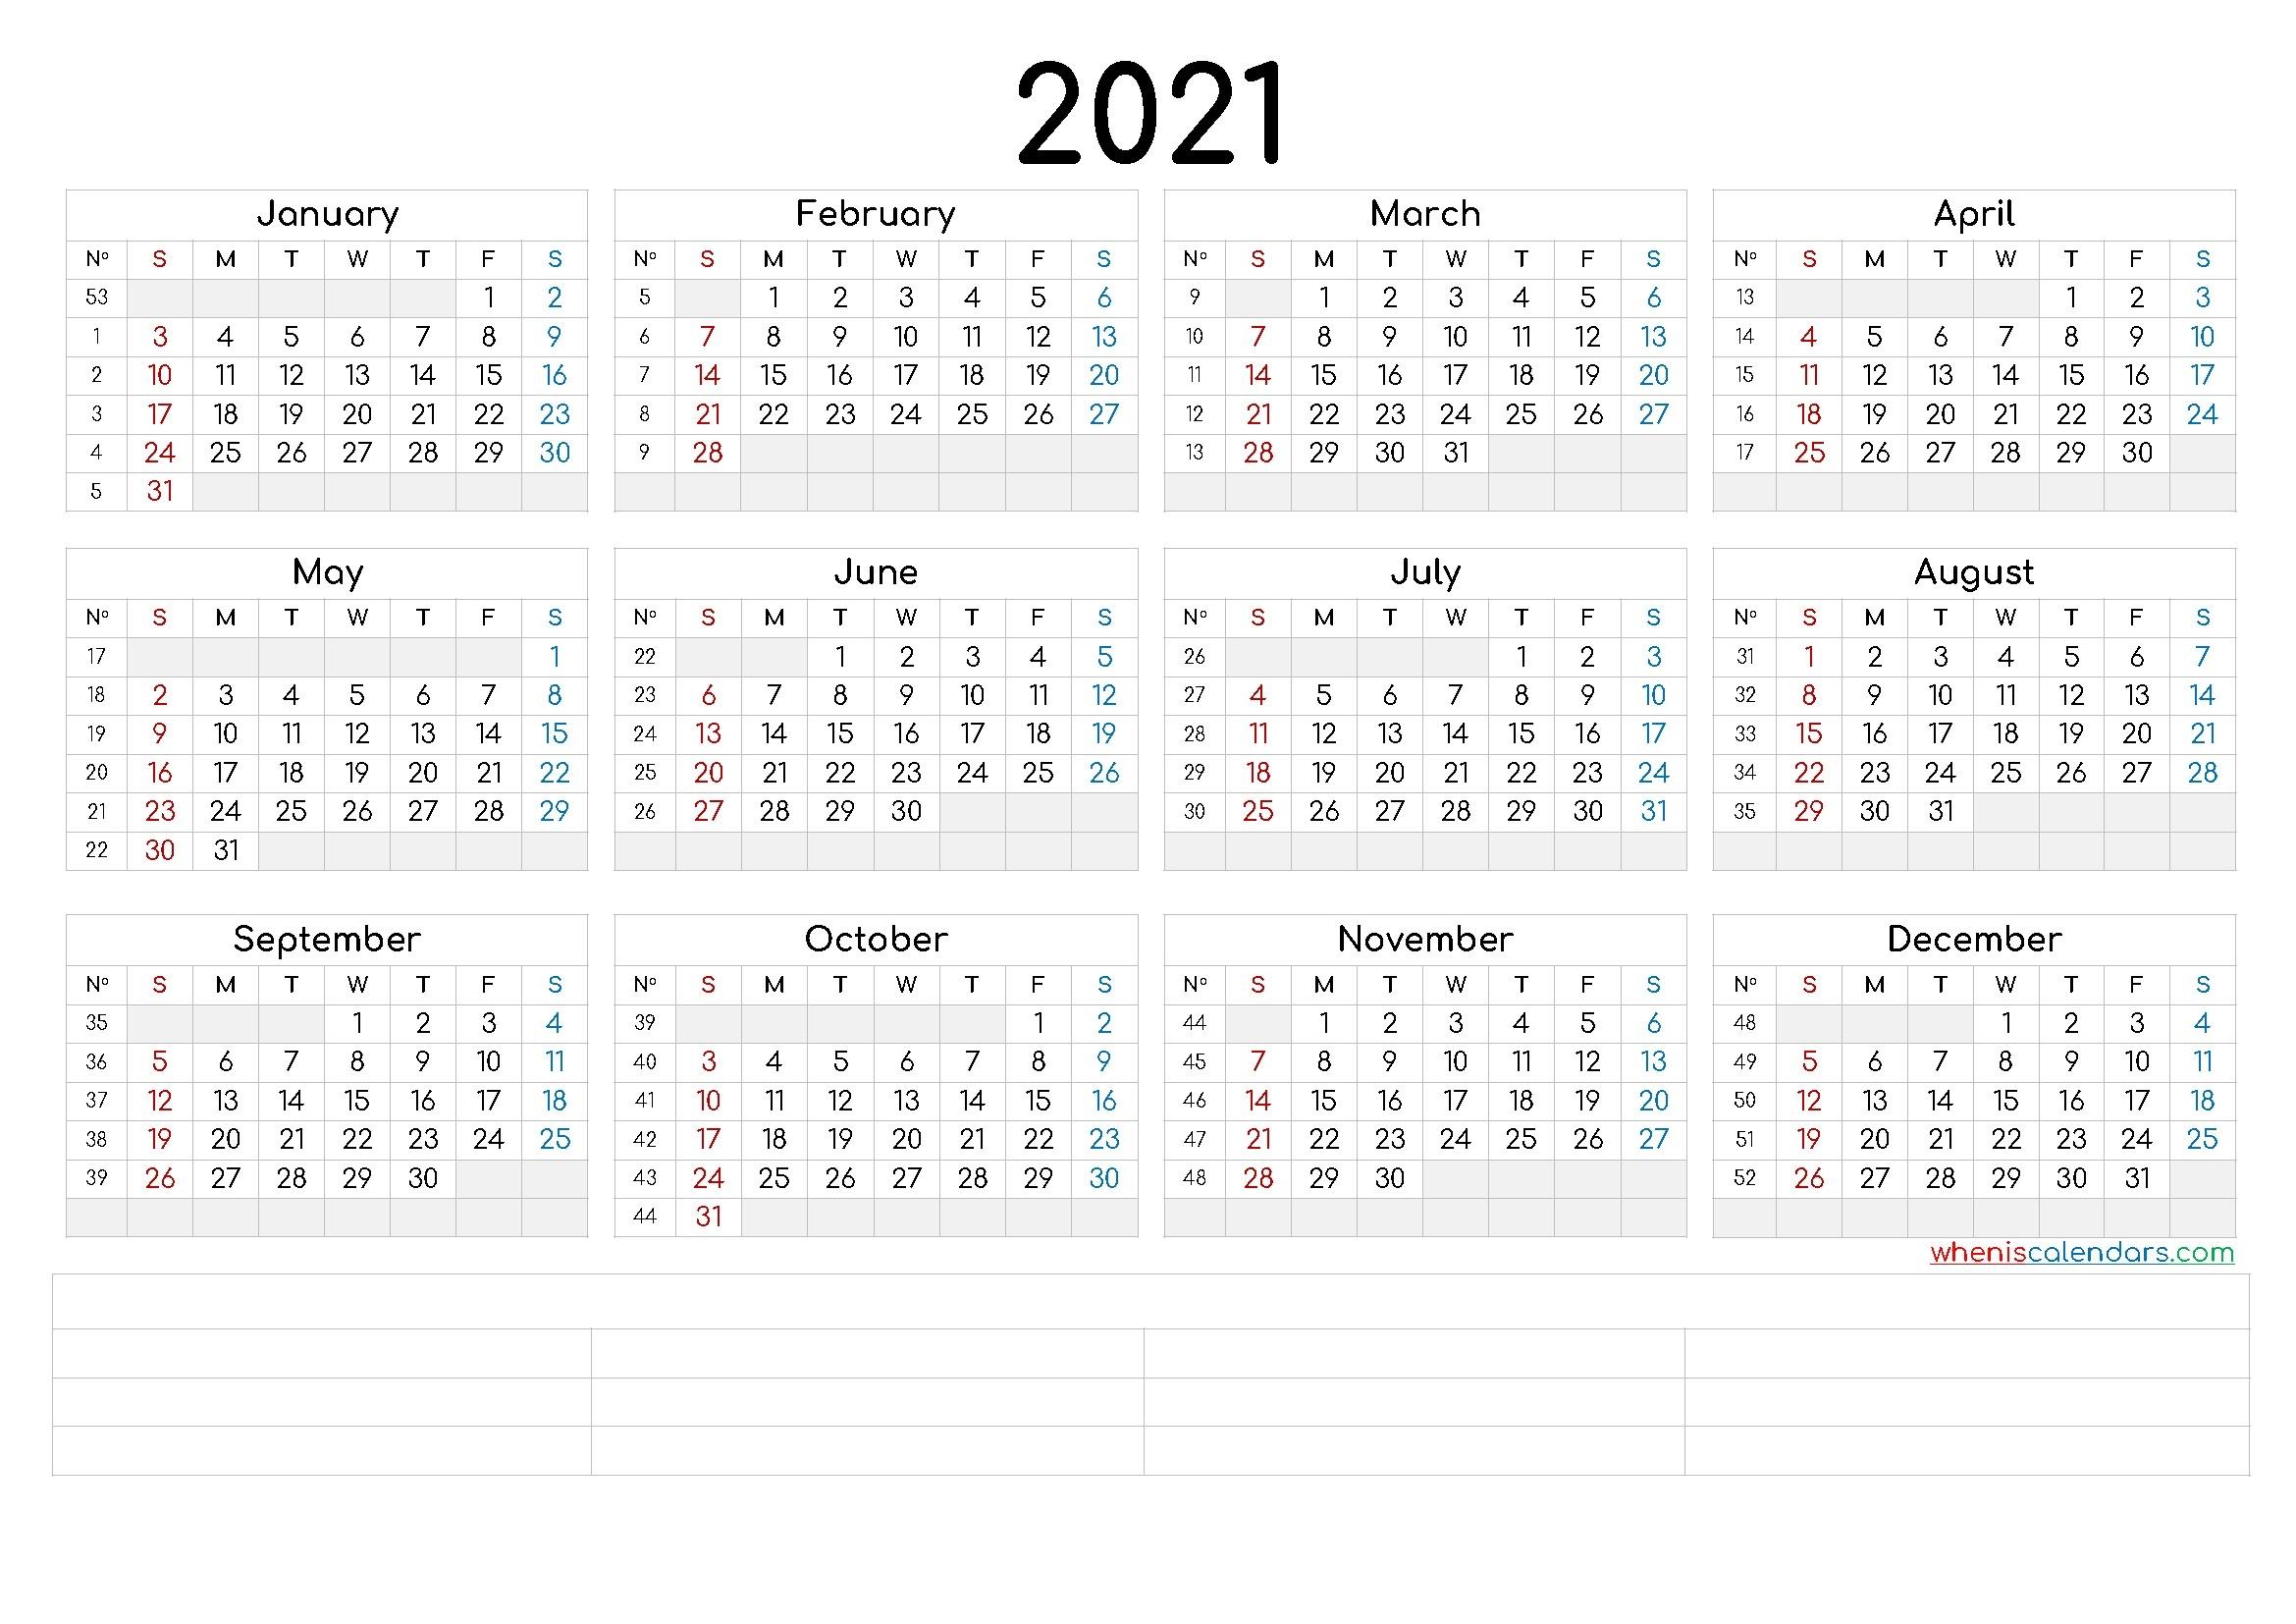 Free Printable 2021 Calendar By Year (6 Templates) – Free-4X6 Free Printables 2021 Calendars